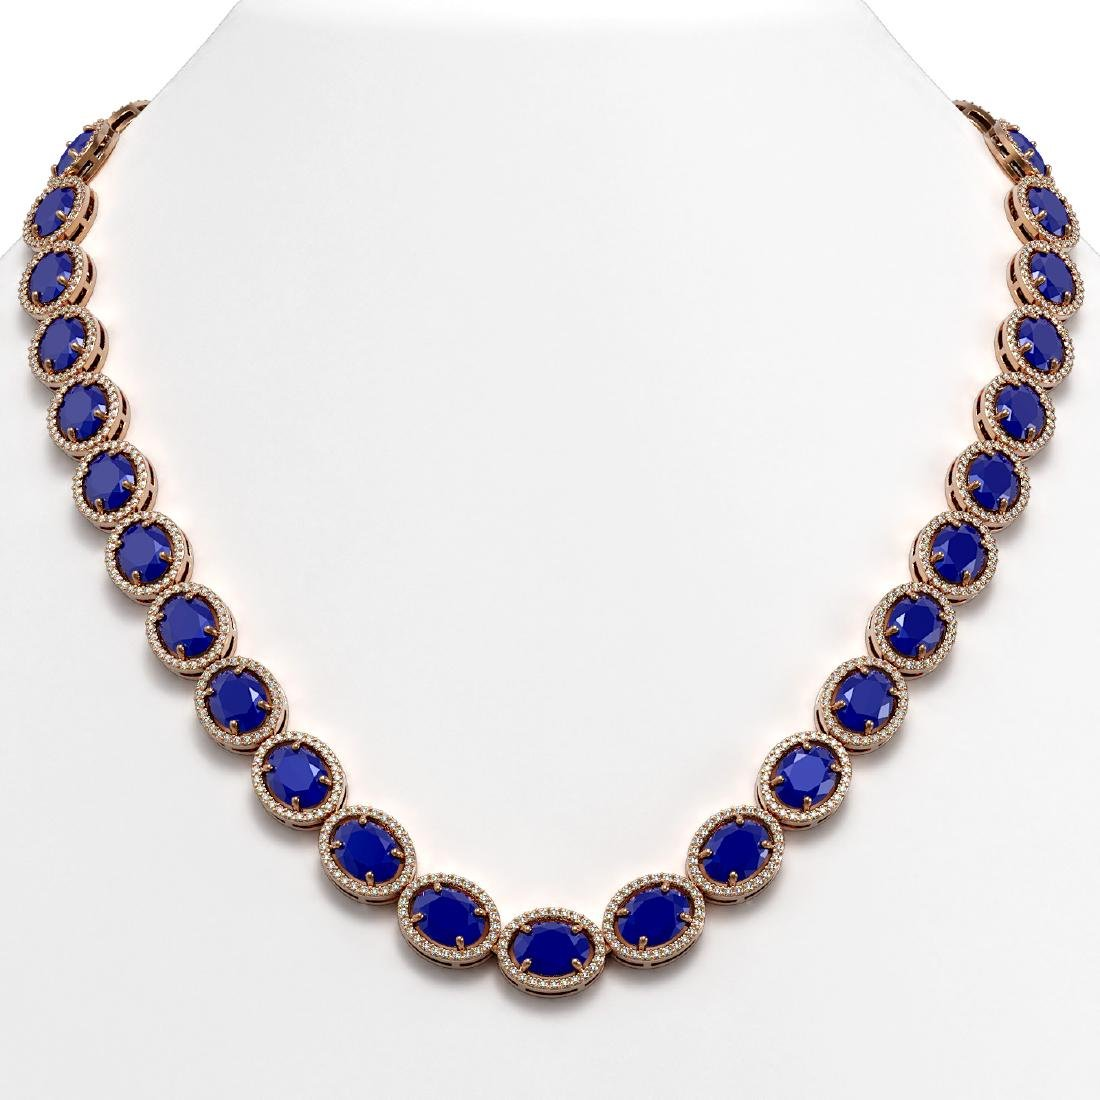 71.87 CTW Sapphire & Diamond Halo Necklace 10K Rose